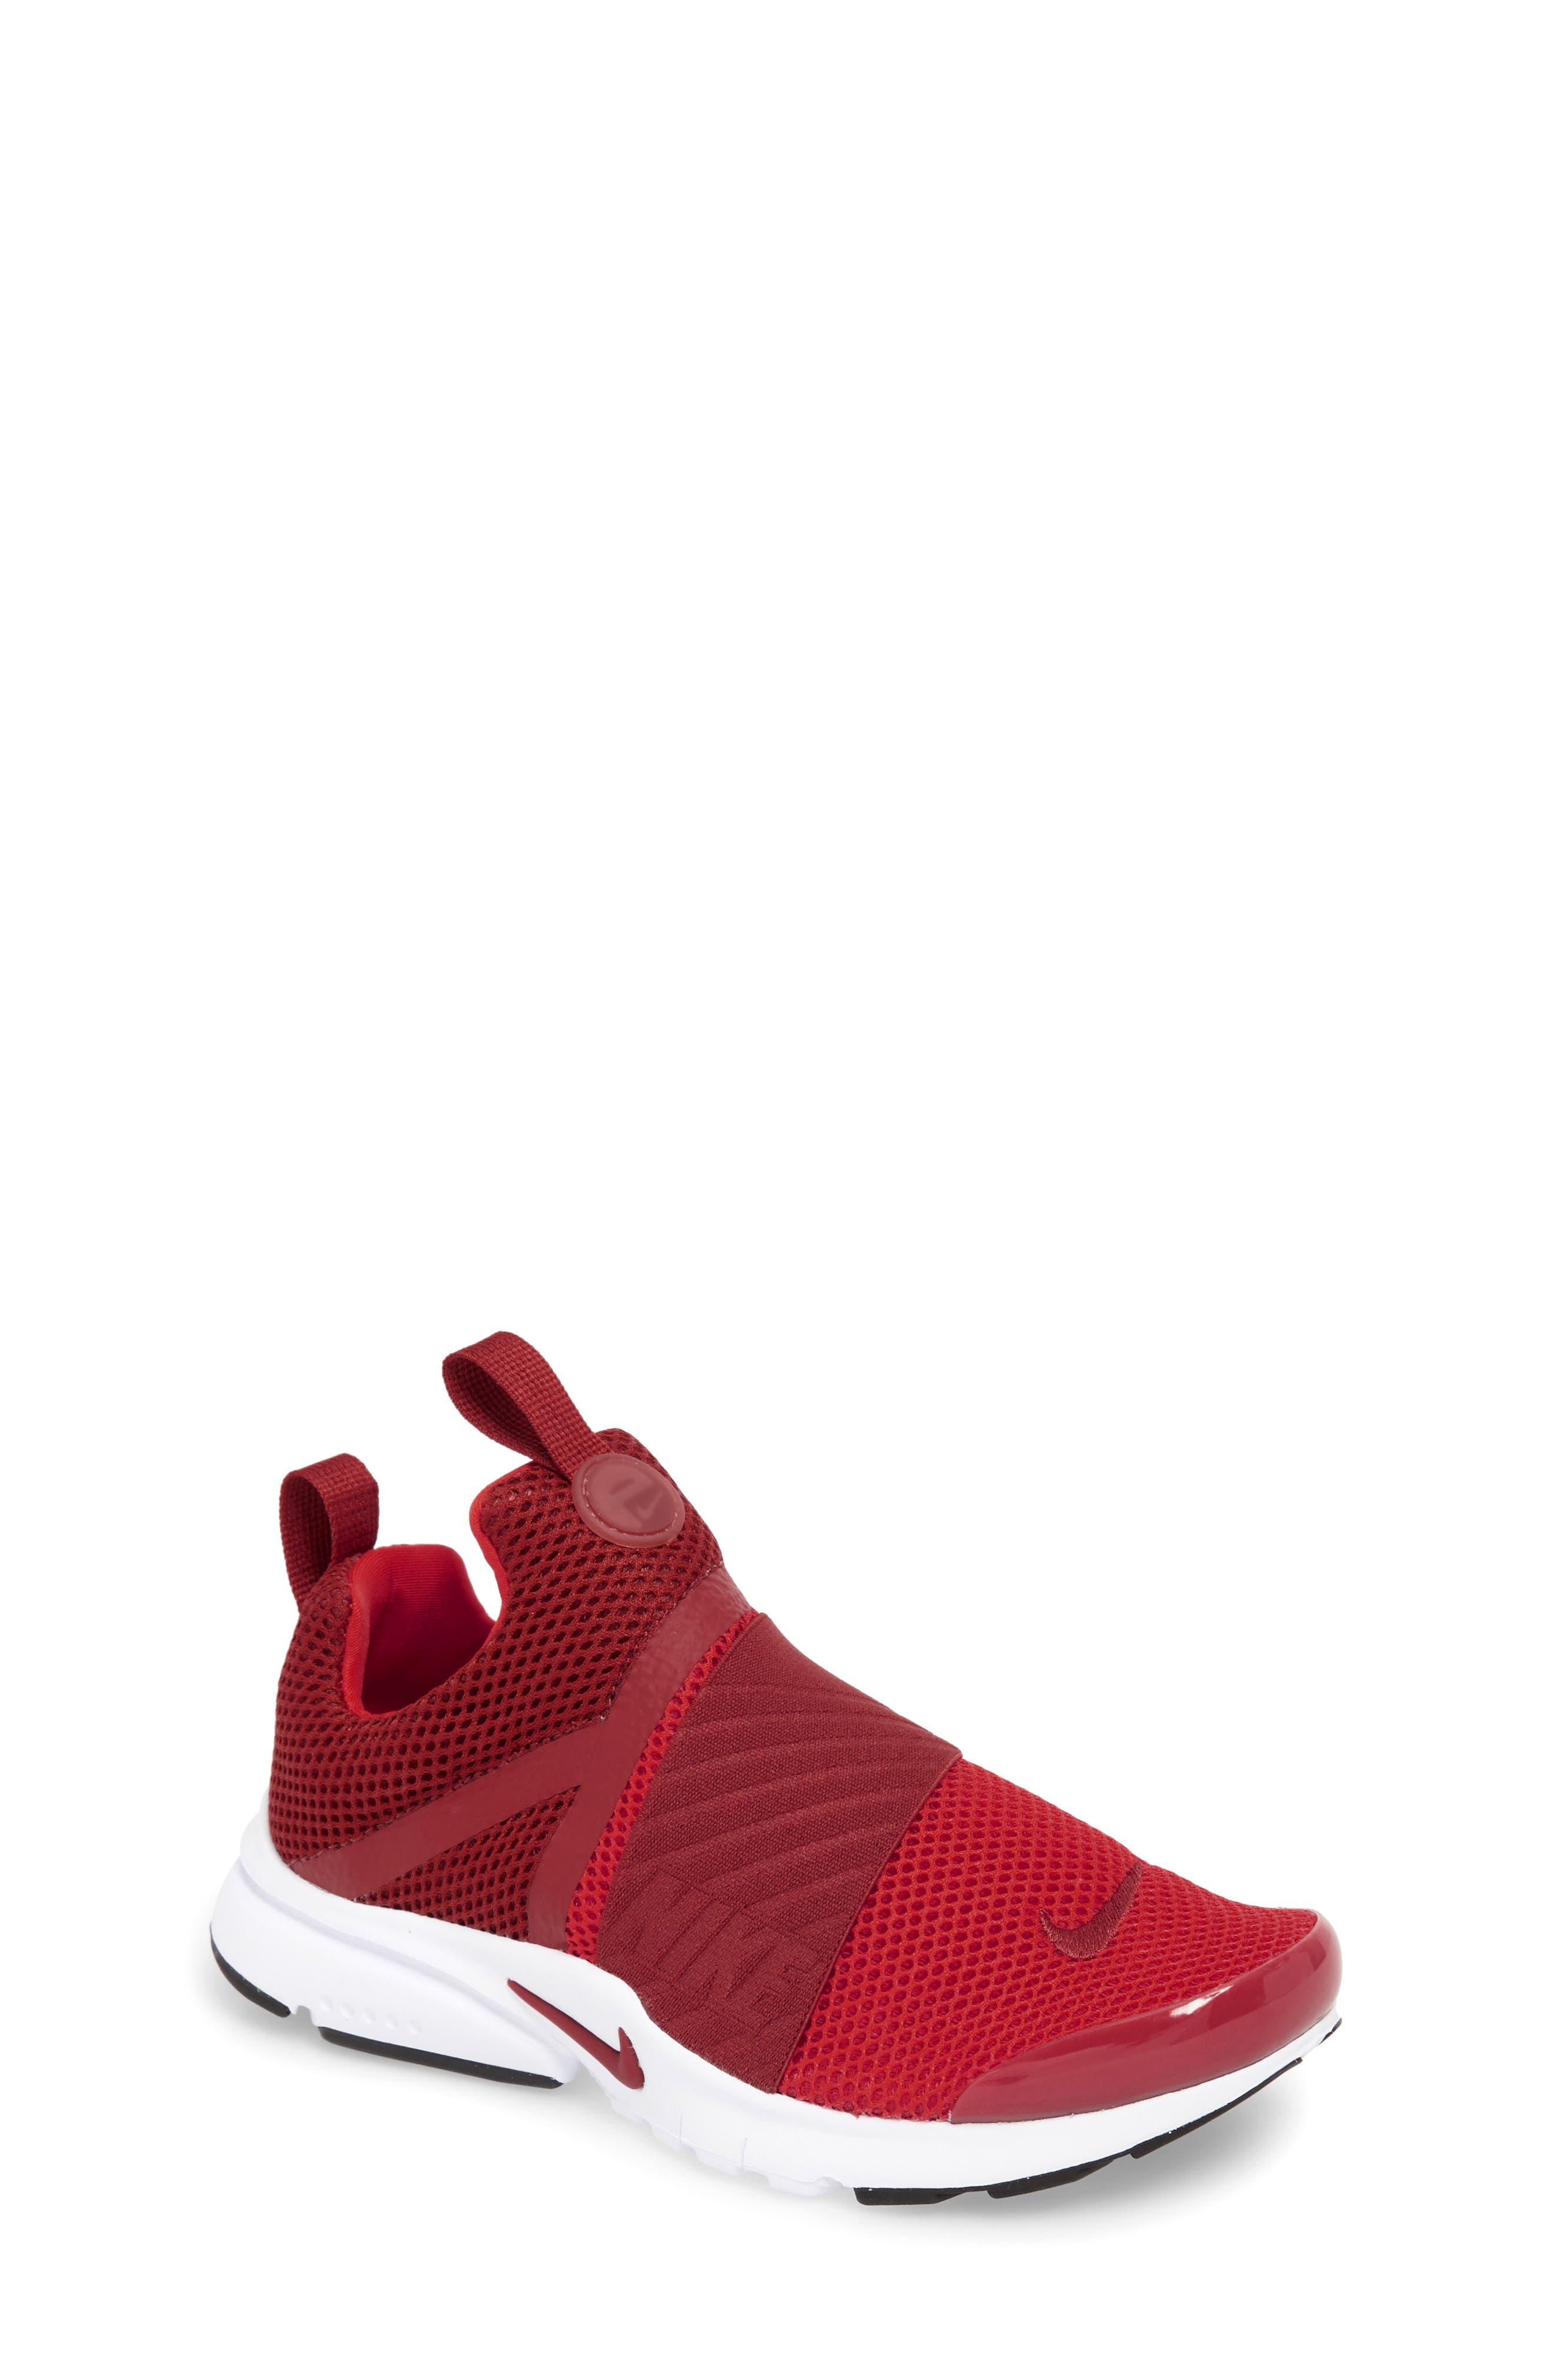 Presto Extreme Sneaker,                             Main thumbnail 6, color,